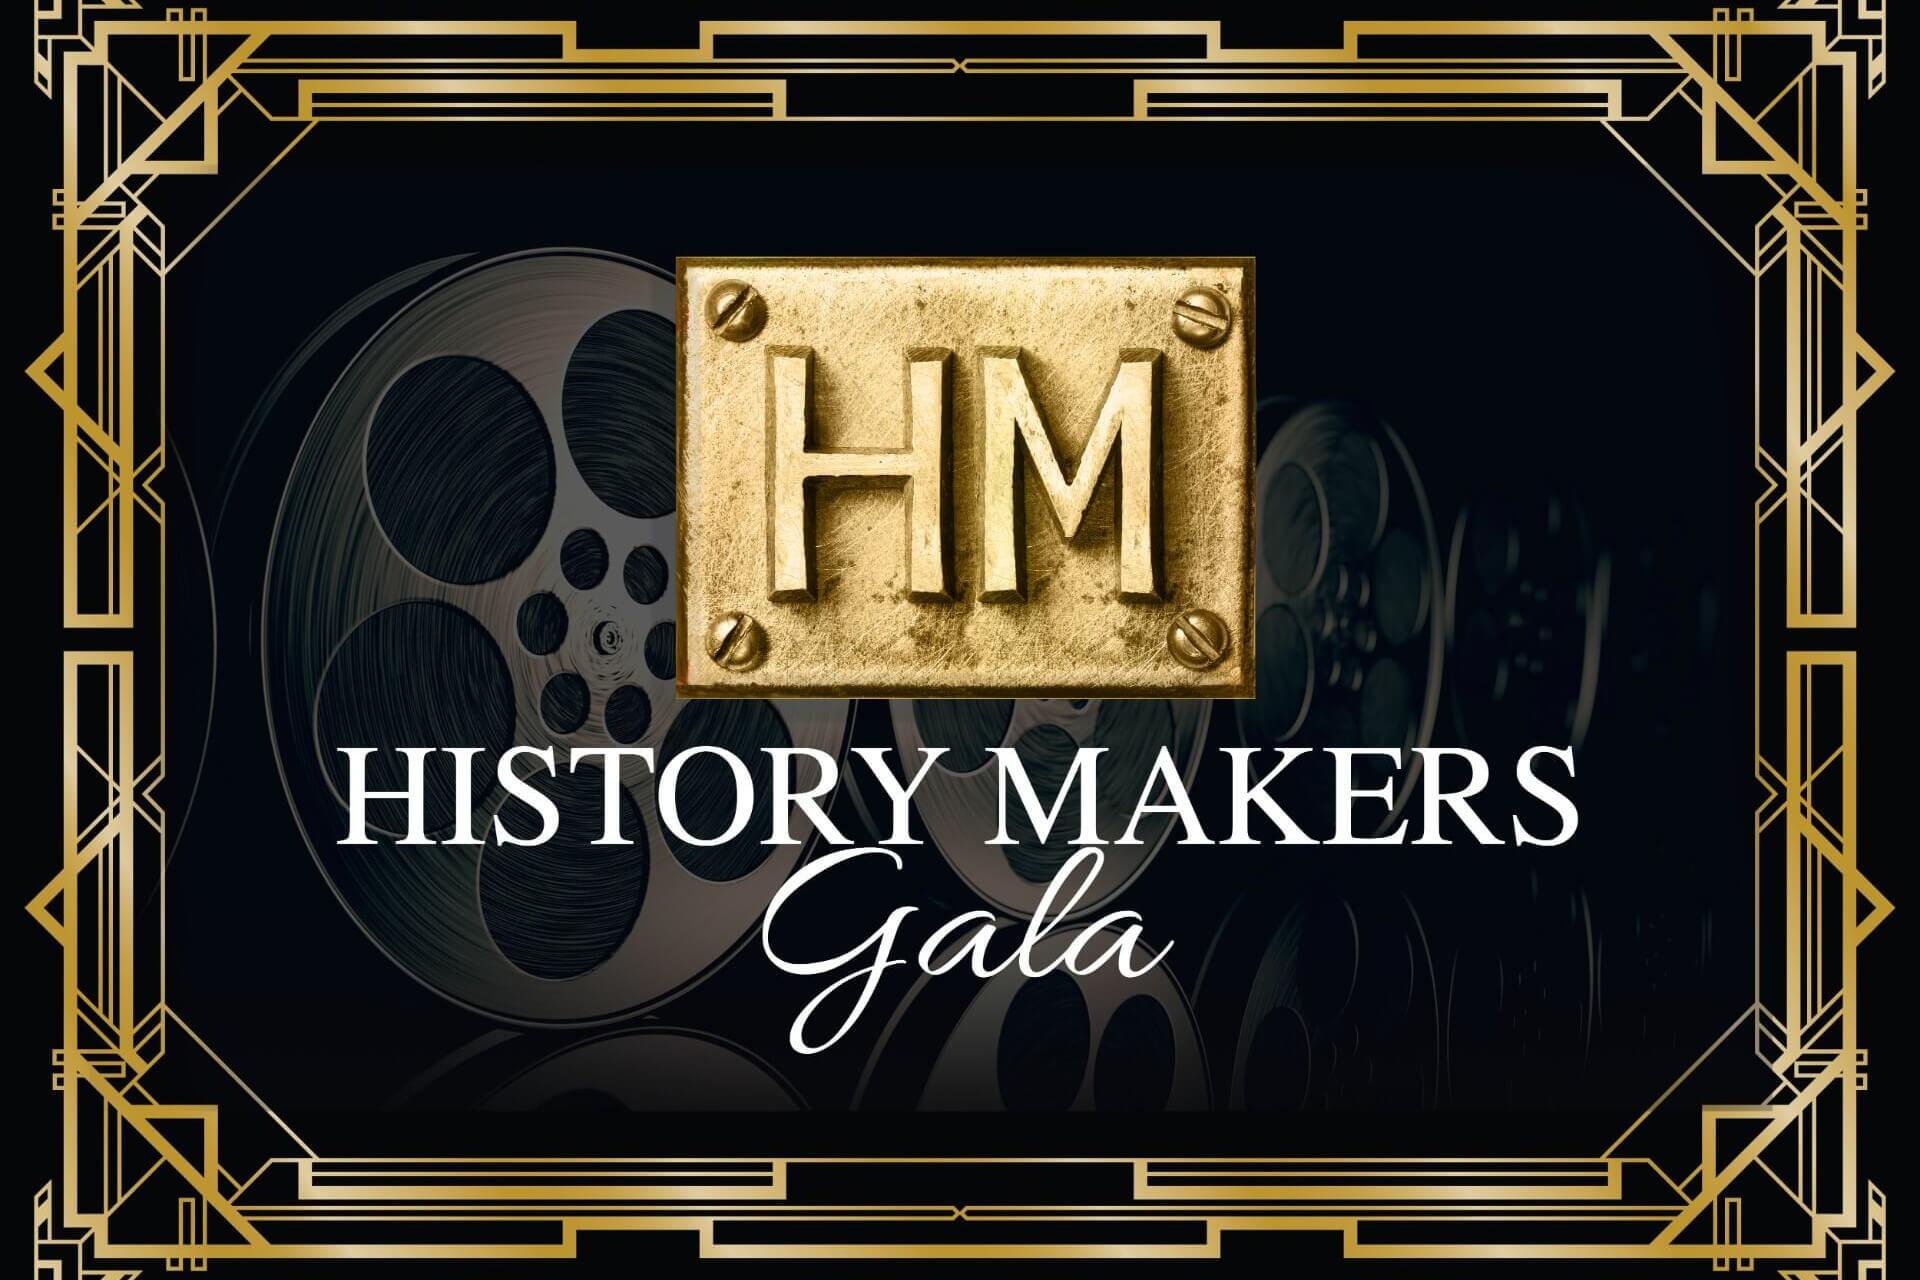 2019 History Makers Gala